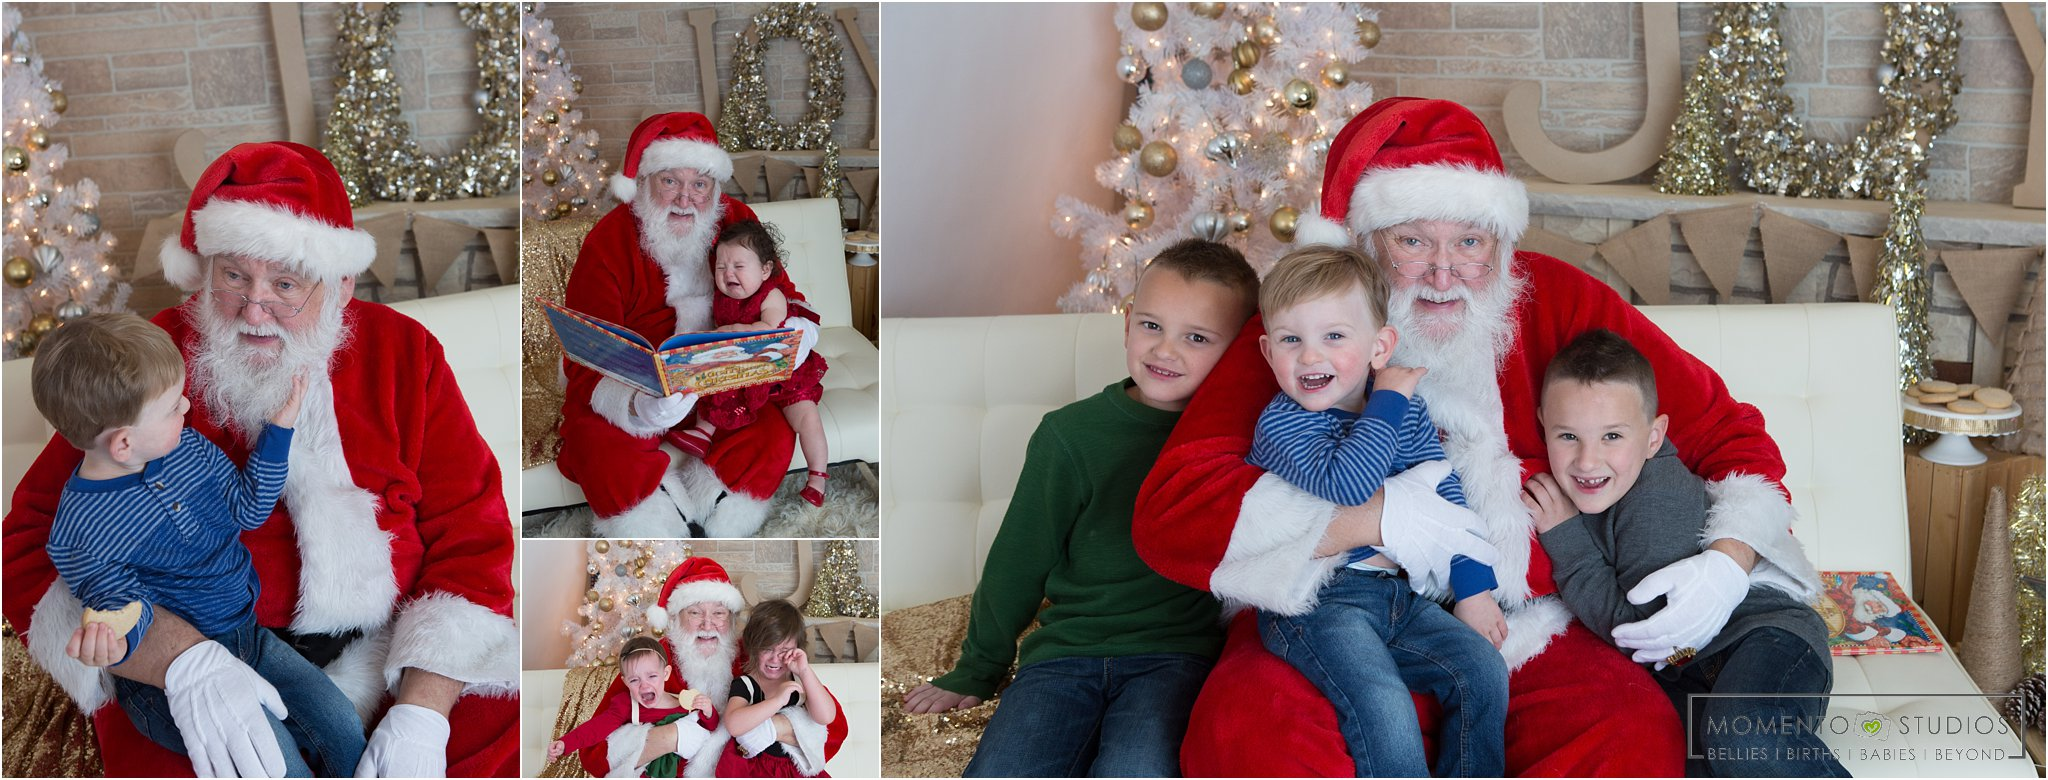 Amsden Santa 2015,